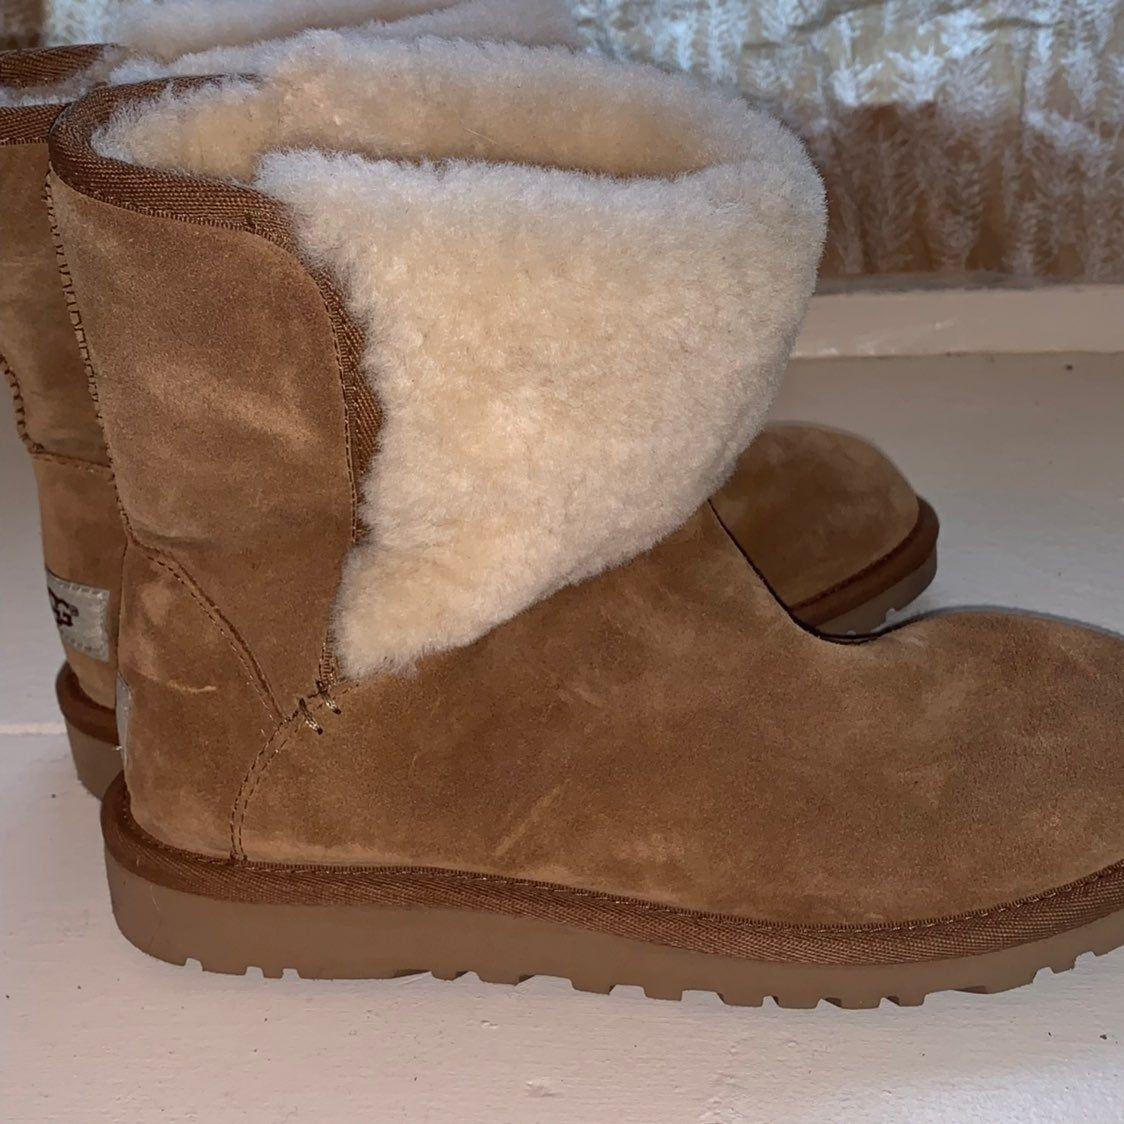 Boots, Ugg boots australia, Uggs